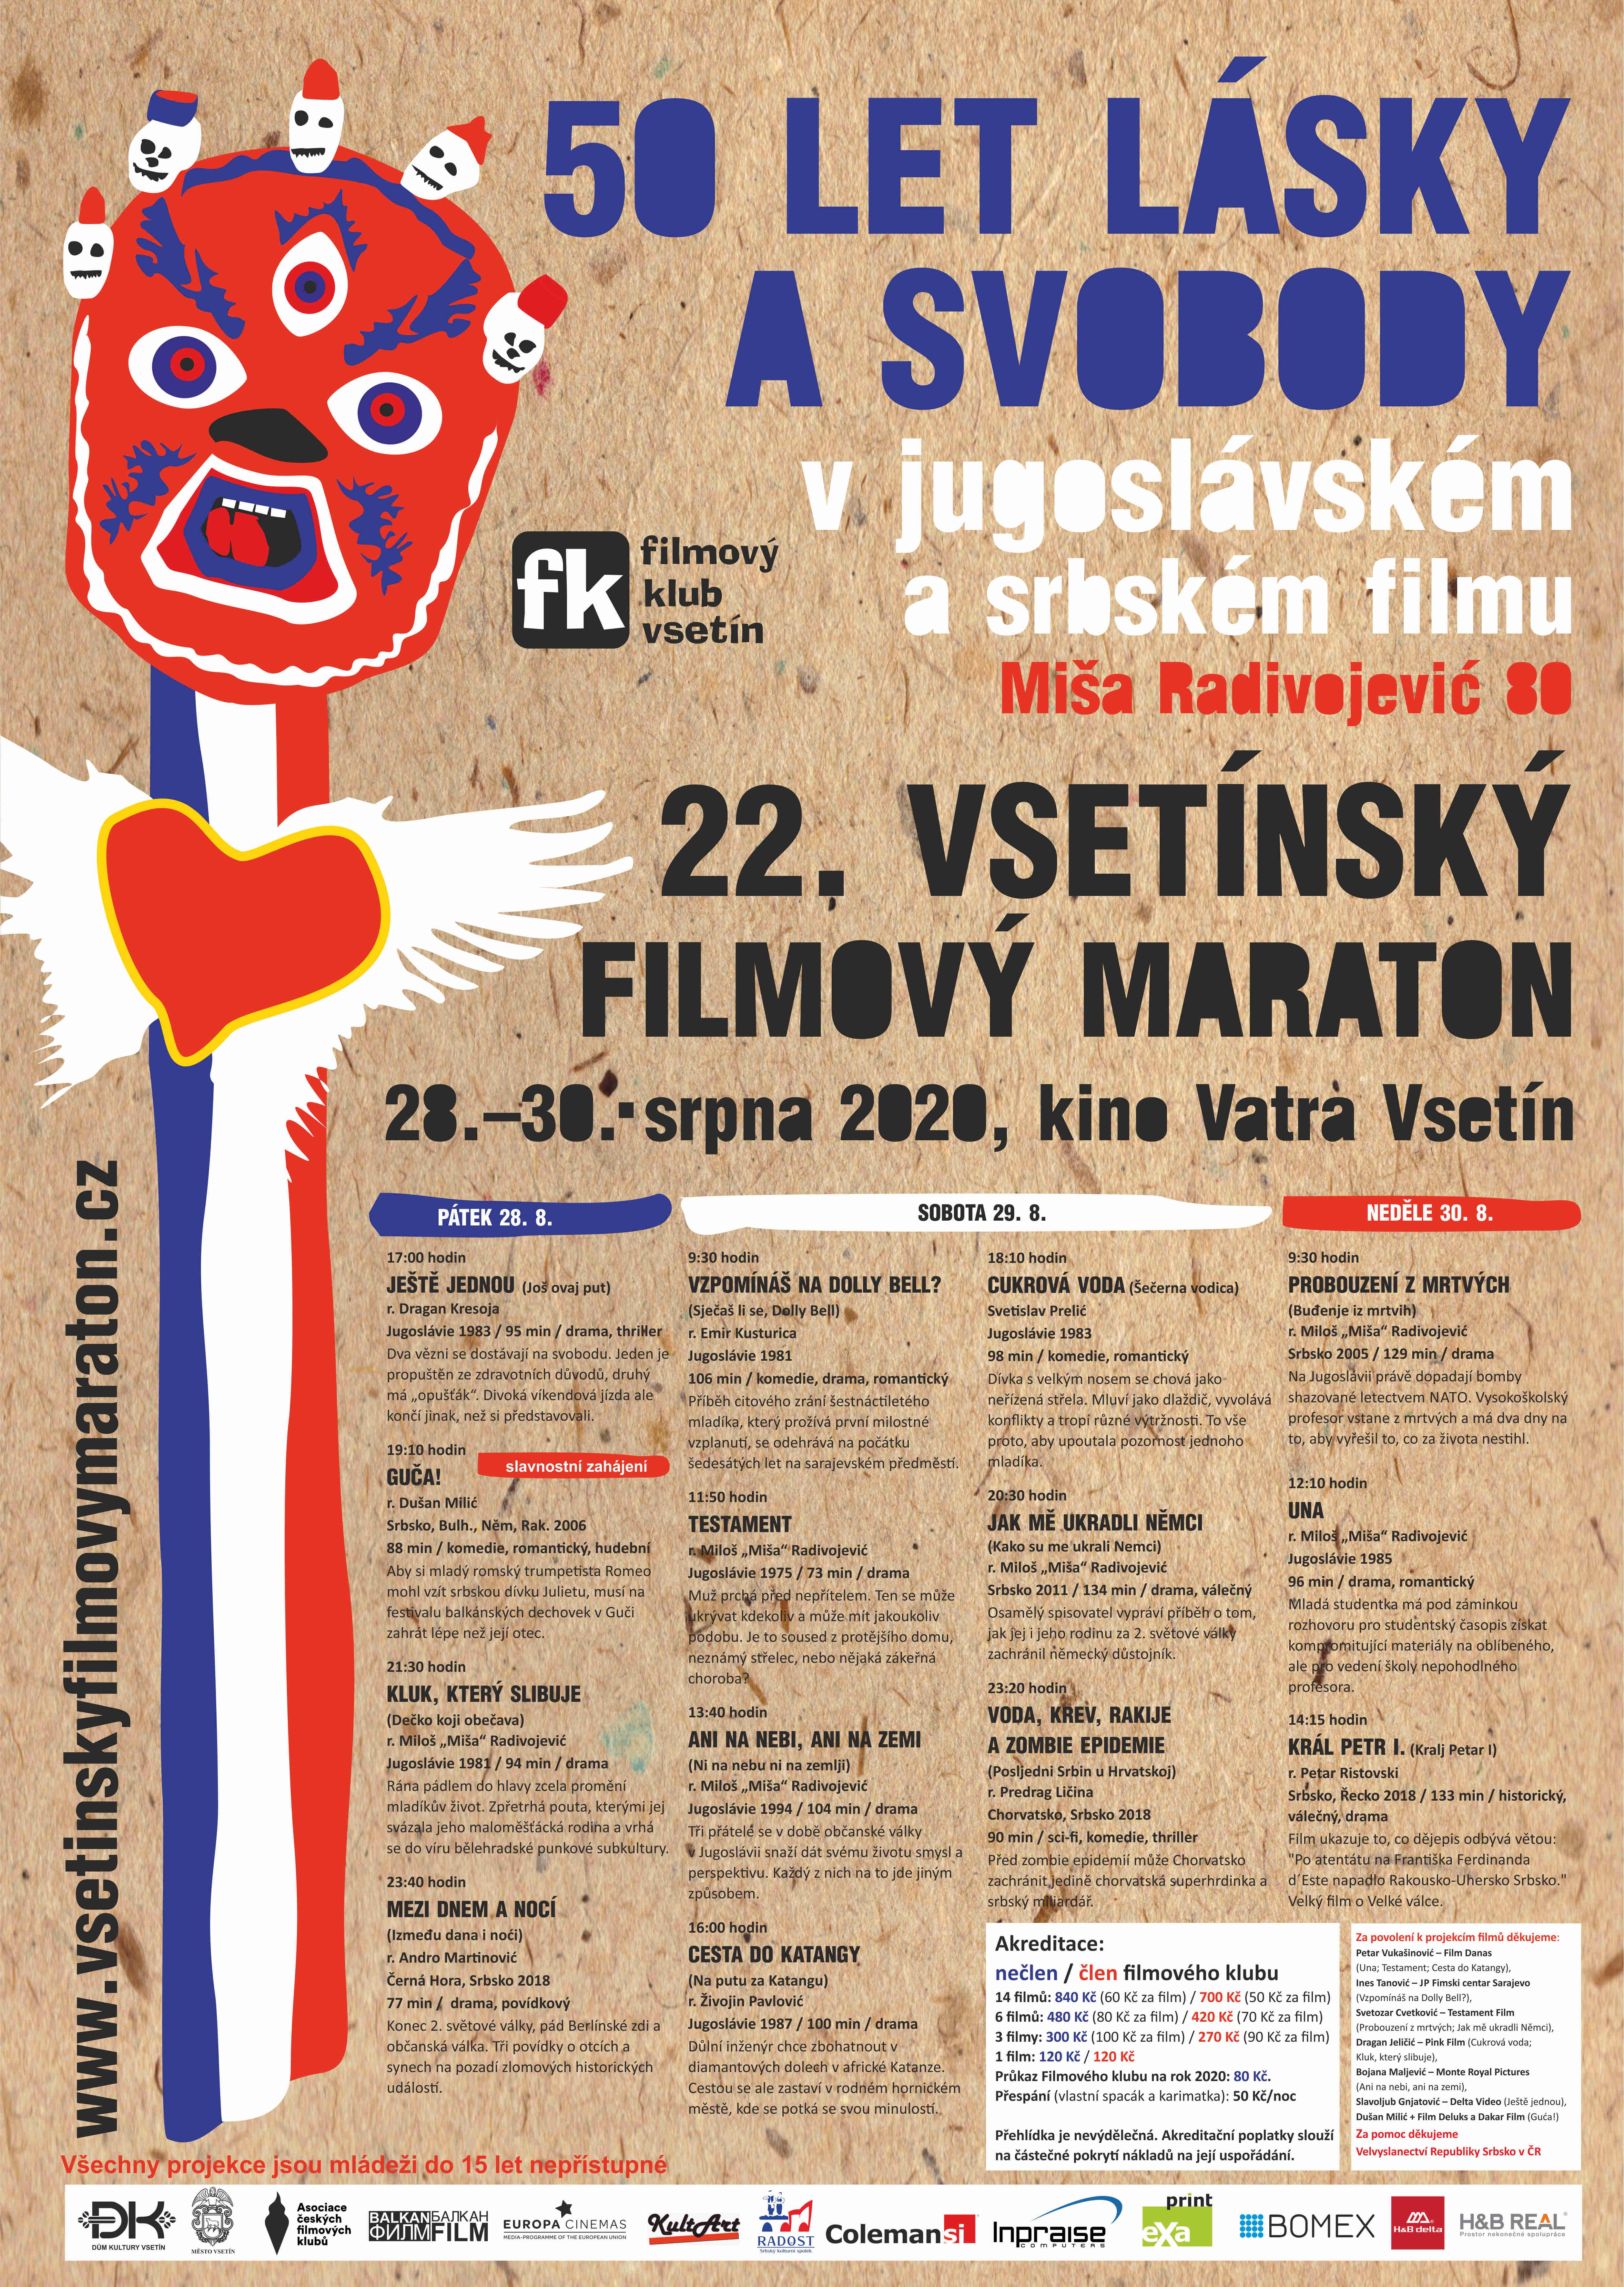 Vsetínský filmový maraton 2020